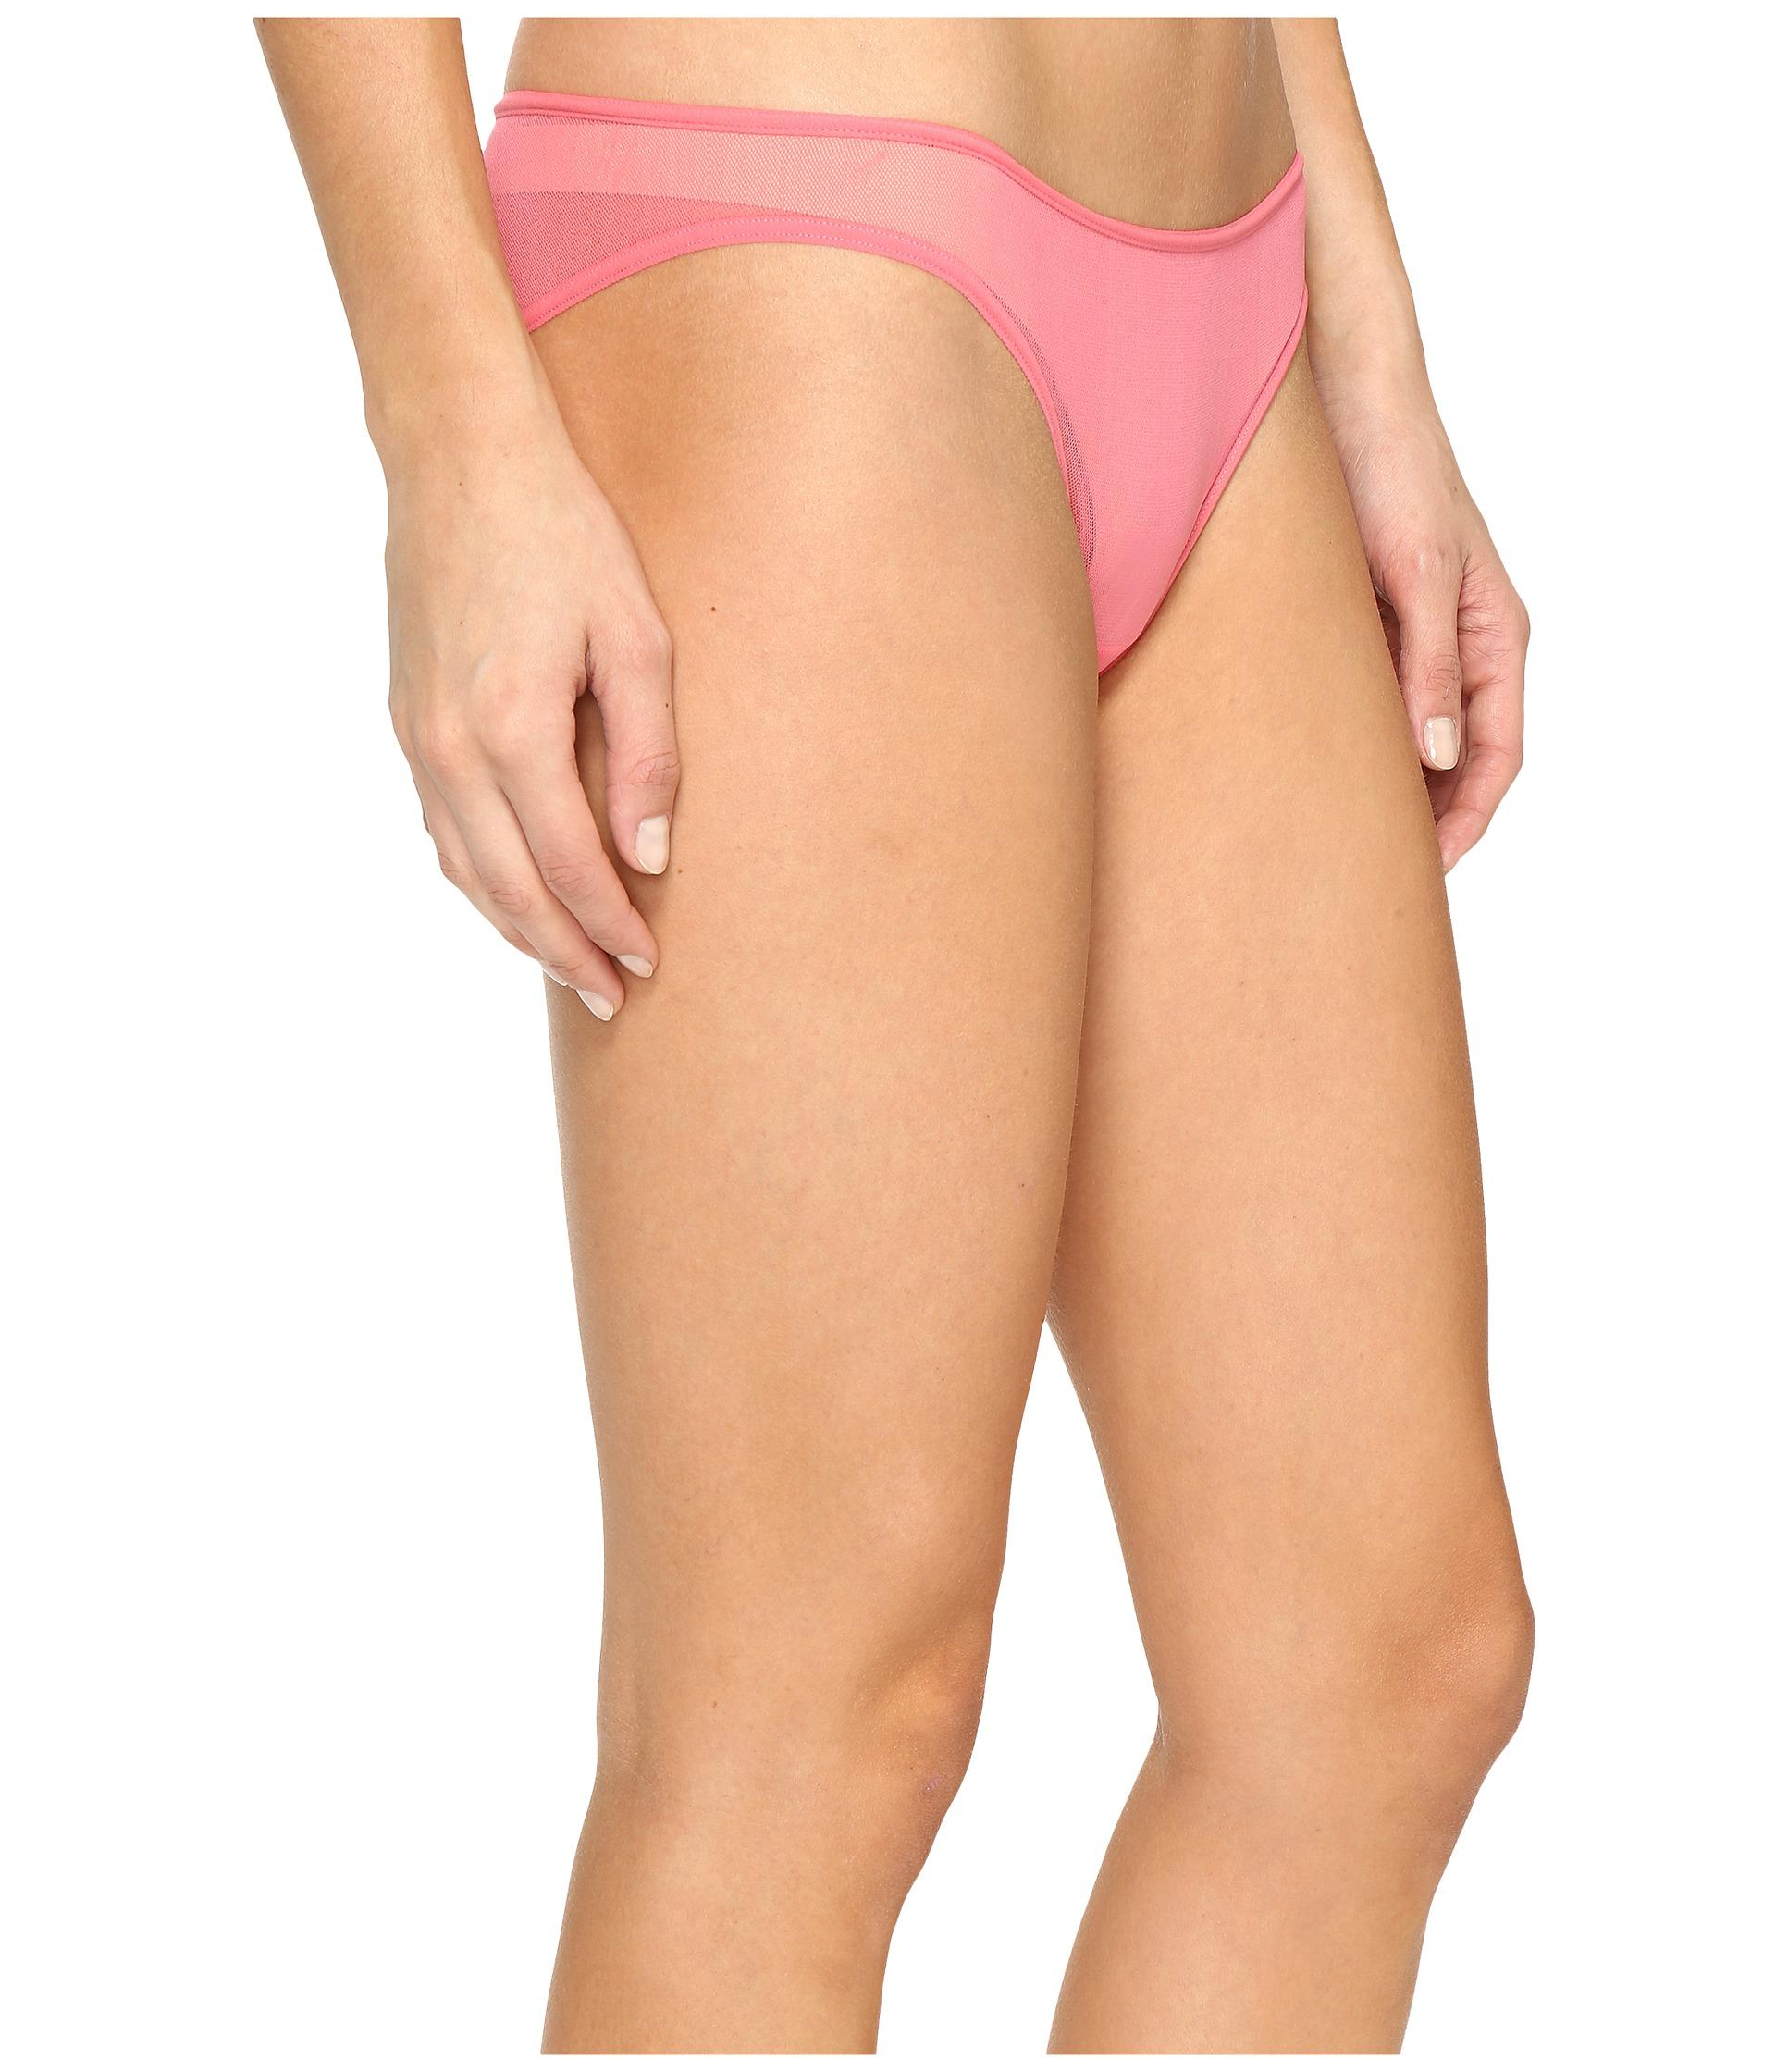 cosabella new soire lowrider bikini   zappos   free shipping both ways